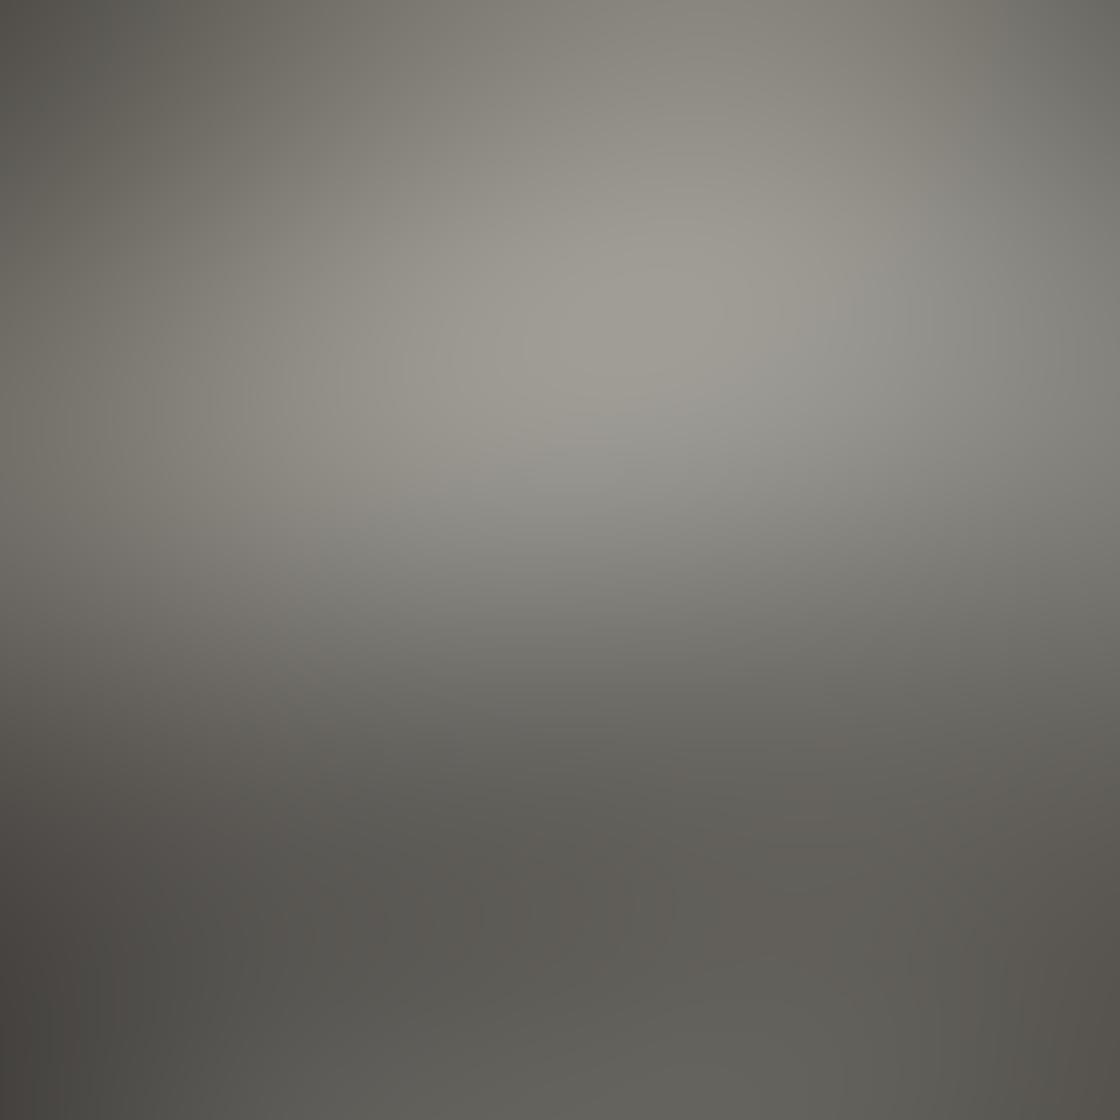 iPhone Angle Photo 16